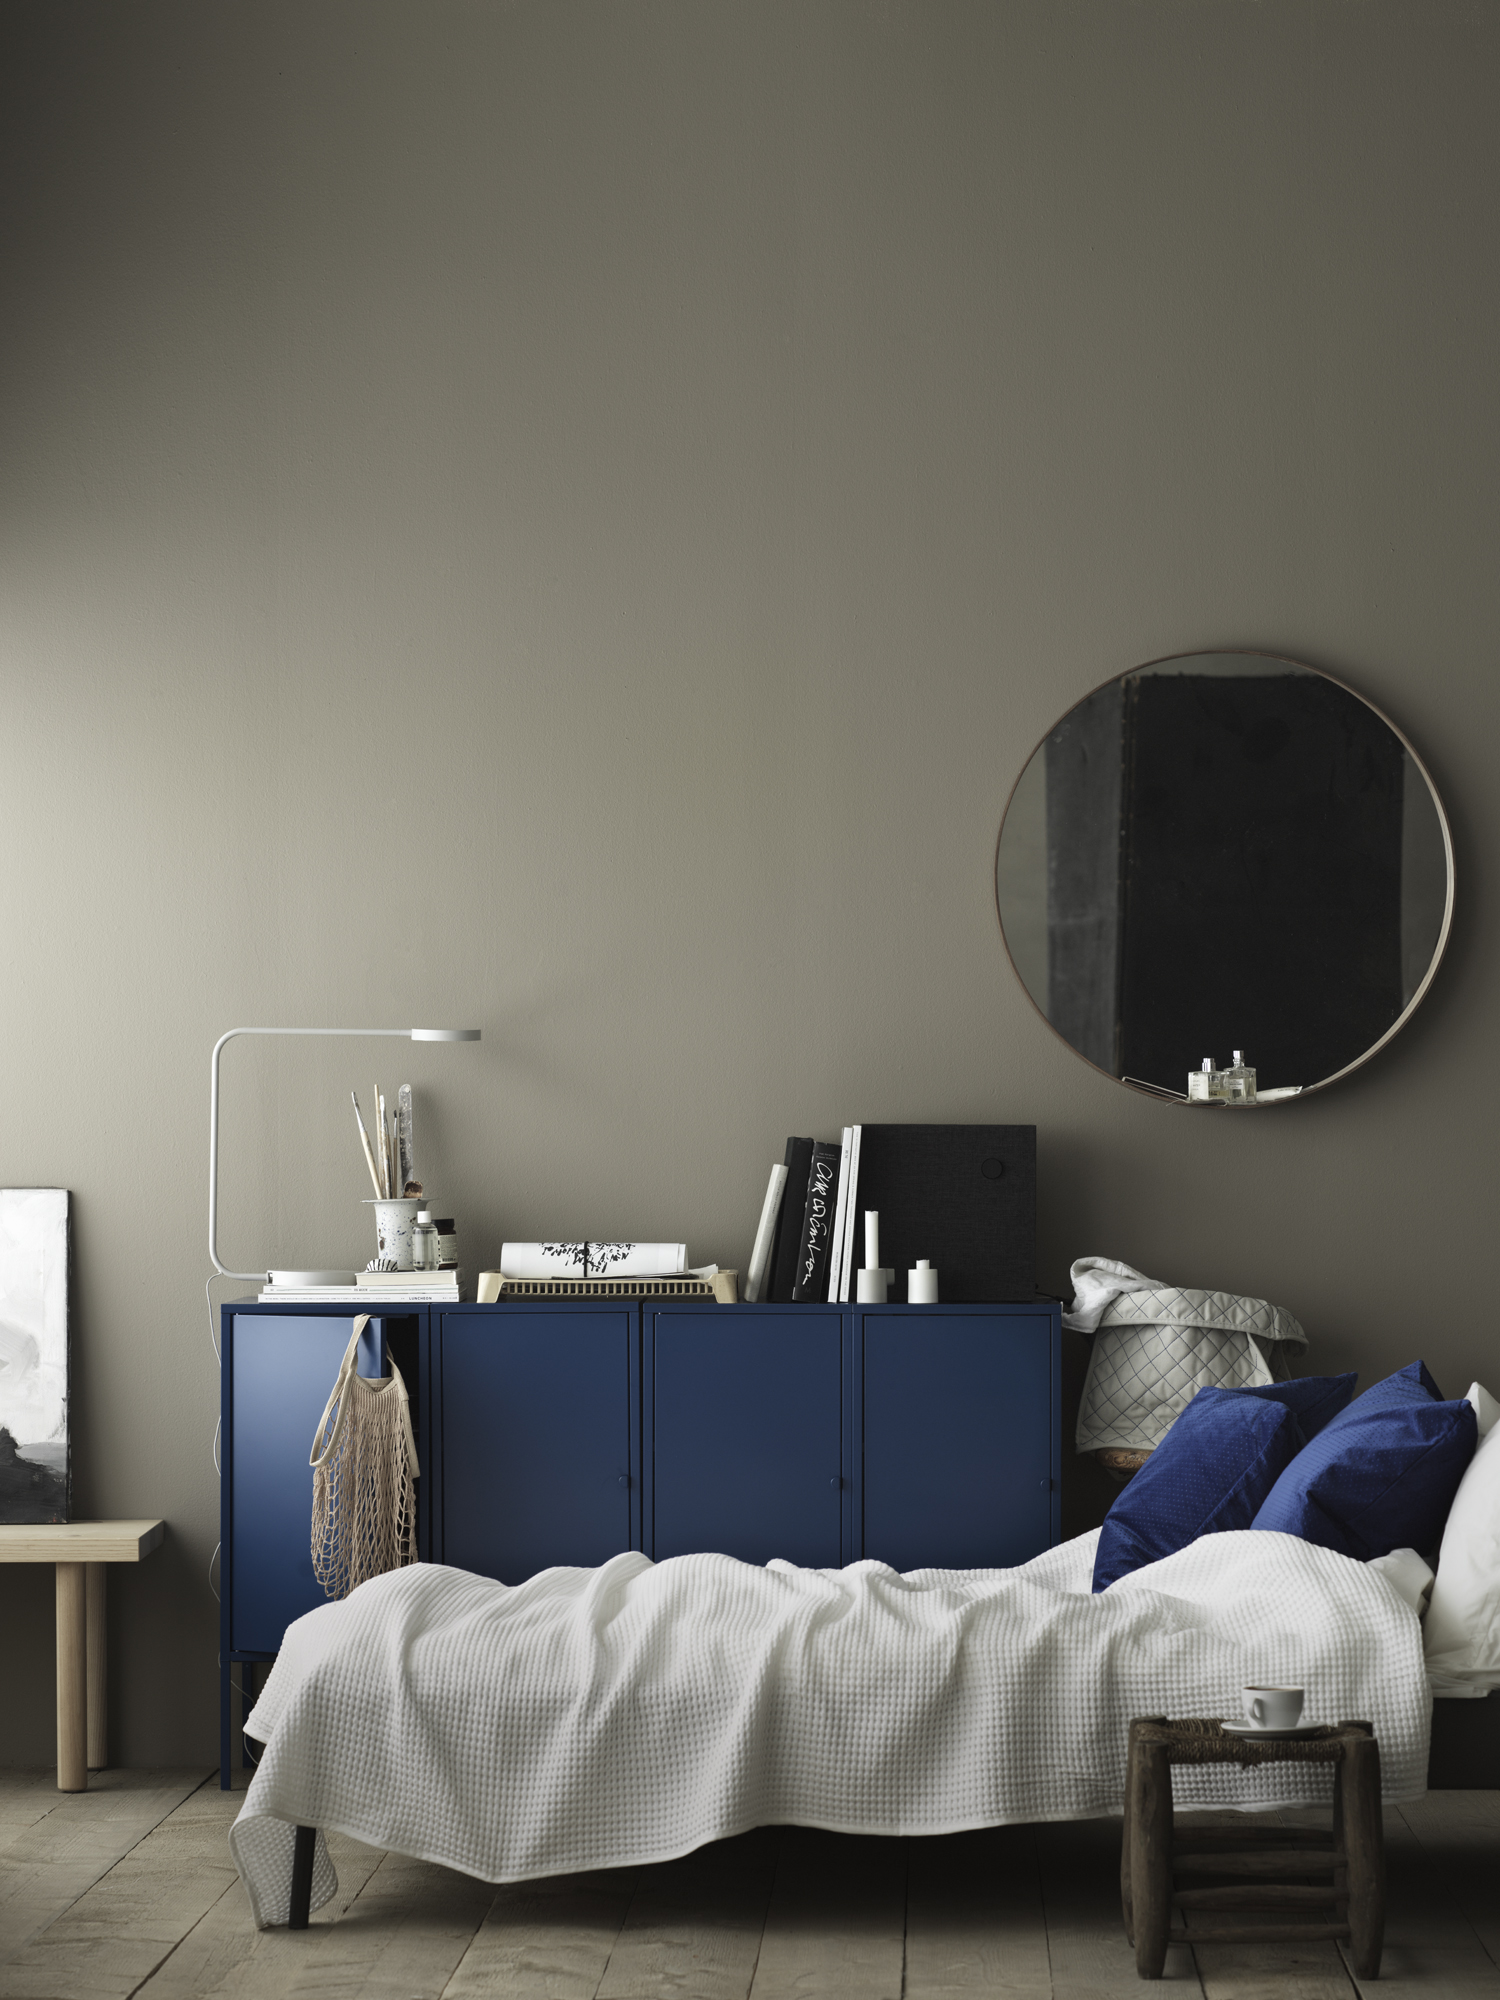 IKEA_1414.jpg